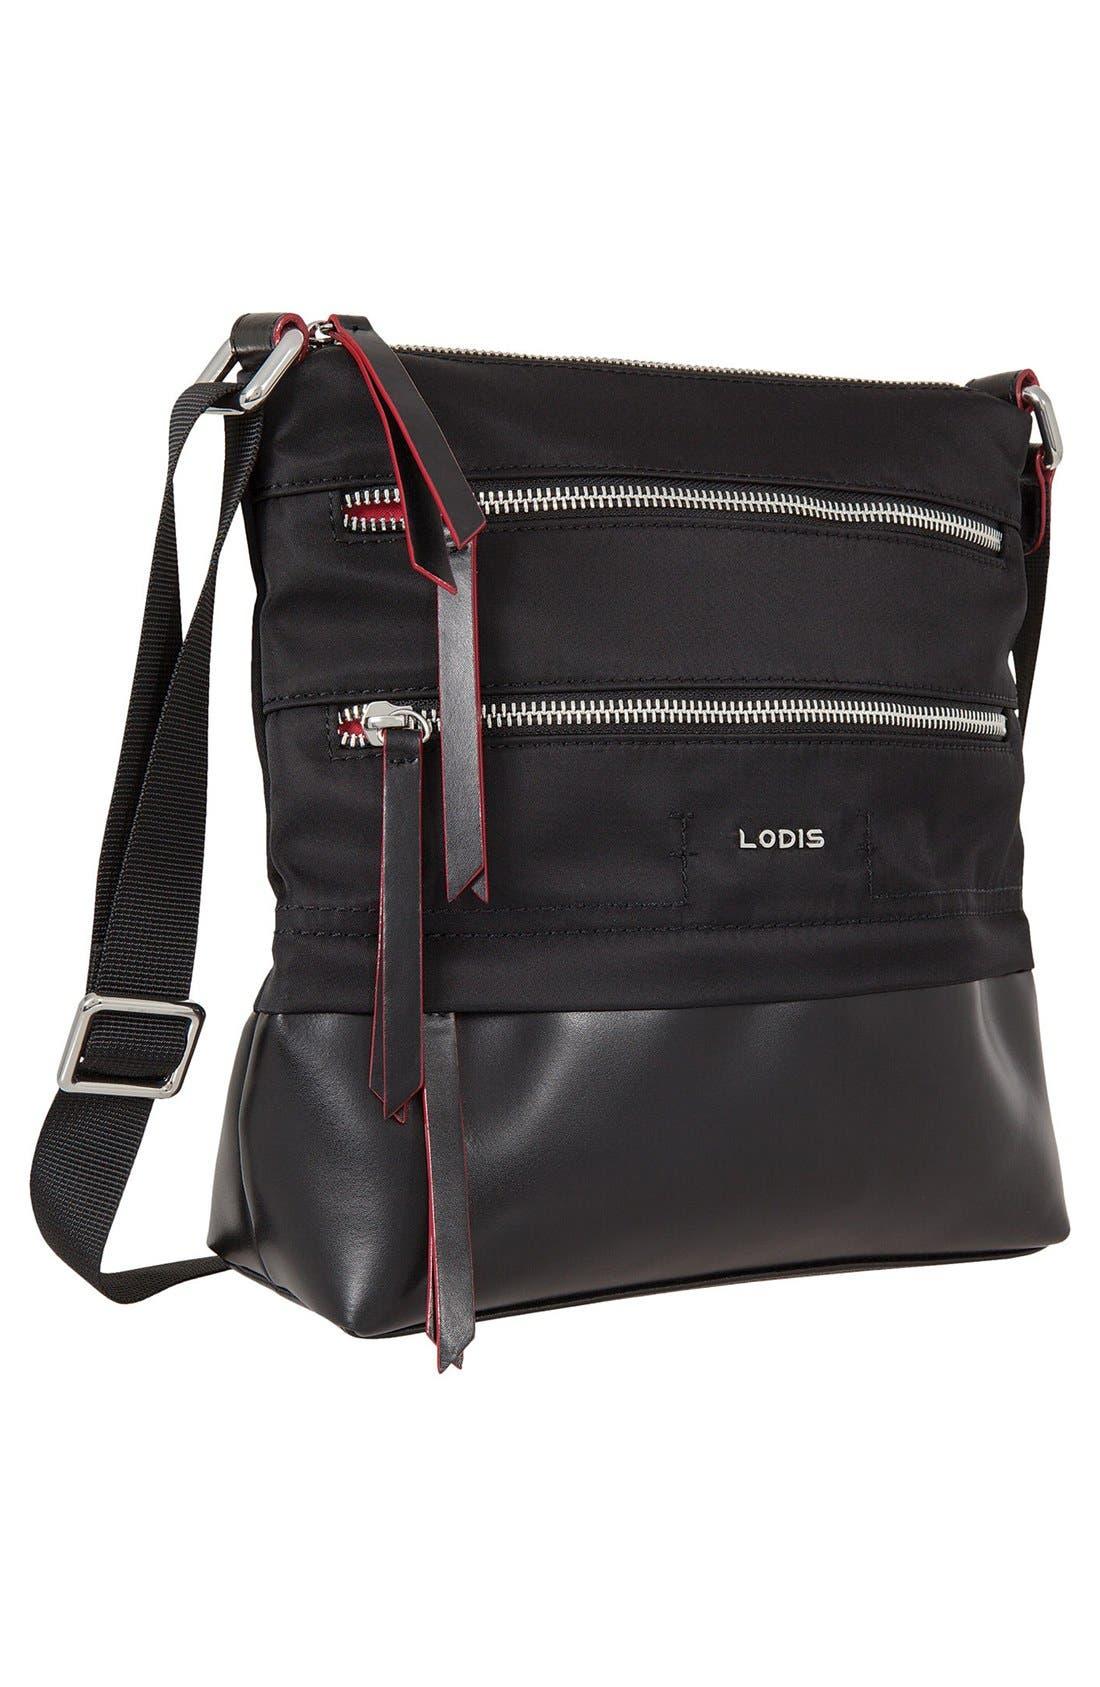 Wanda RFID Nylon & Leather Crossbody Bag,                             Alternate thumbnail 4, color,                             Black